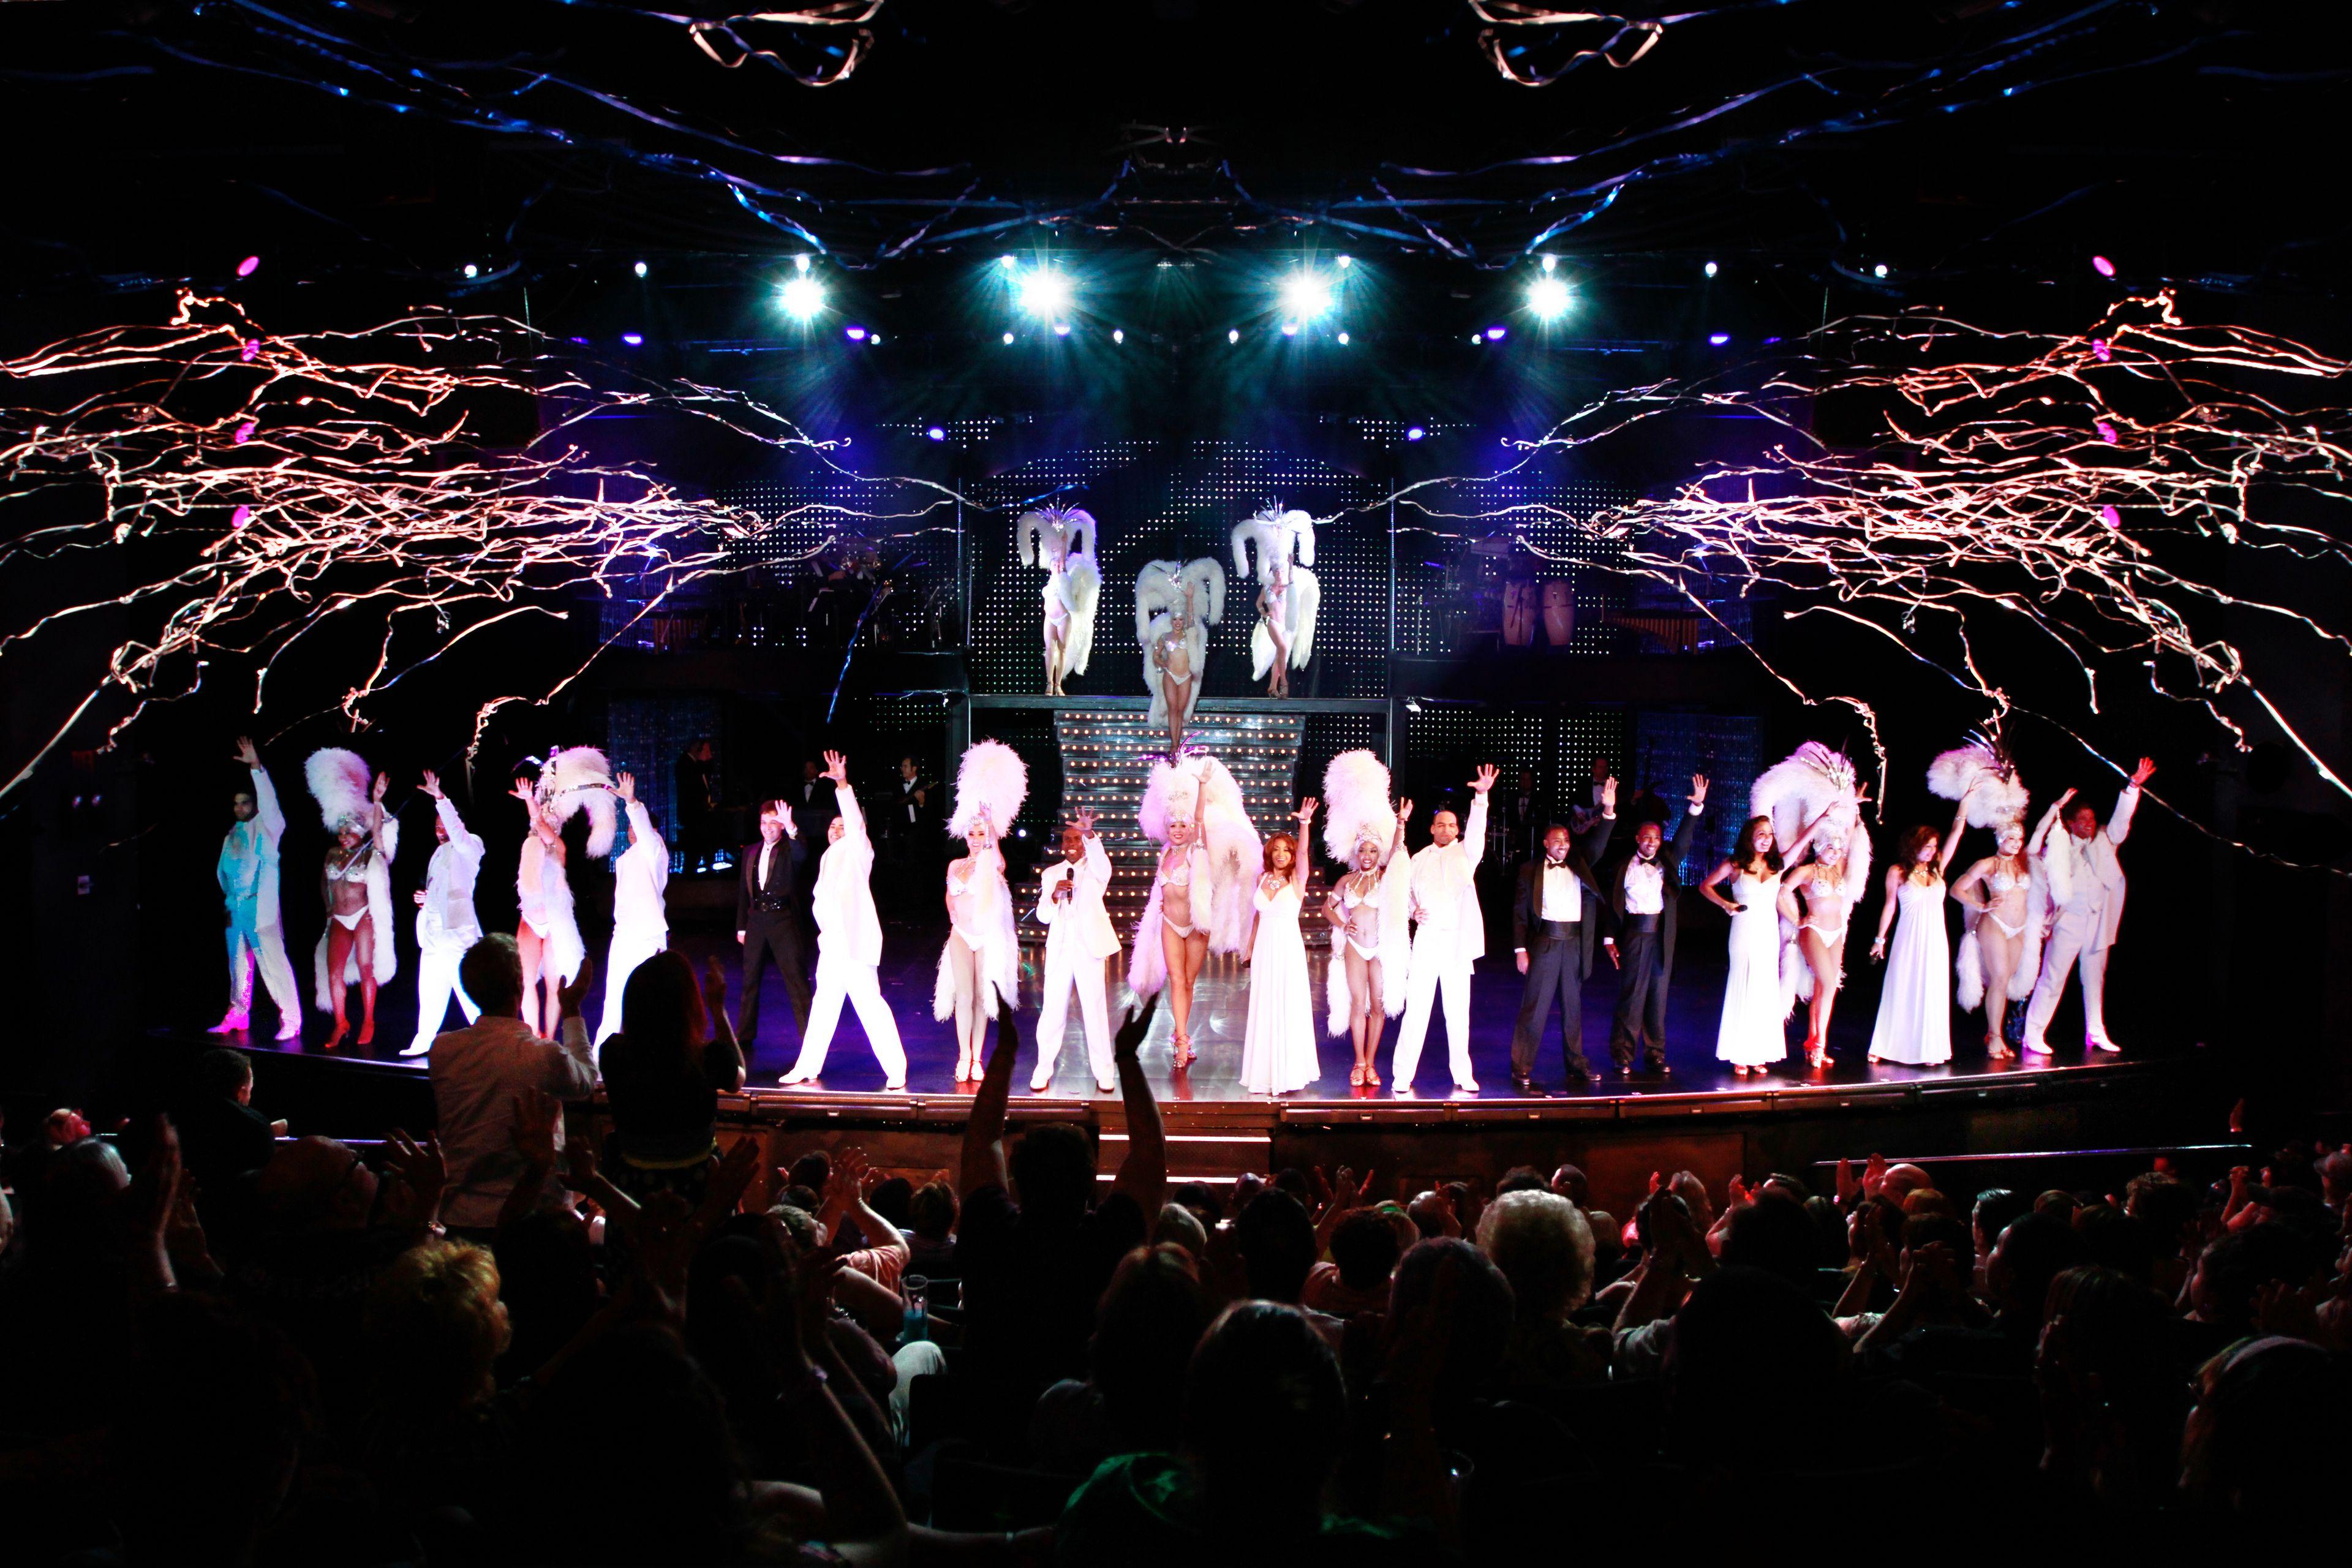 Vegas_The_Show_01.jpg